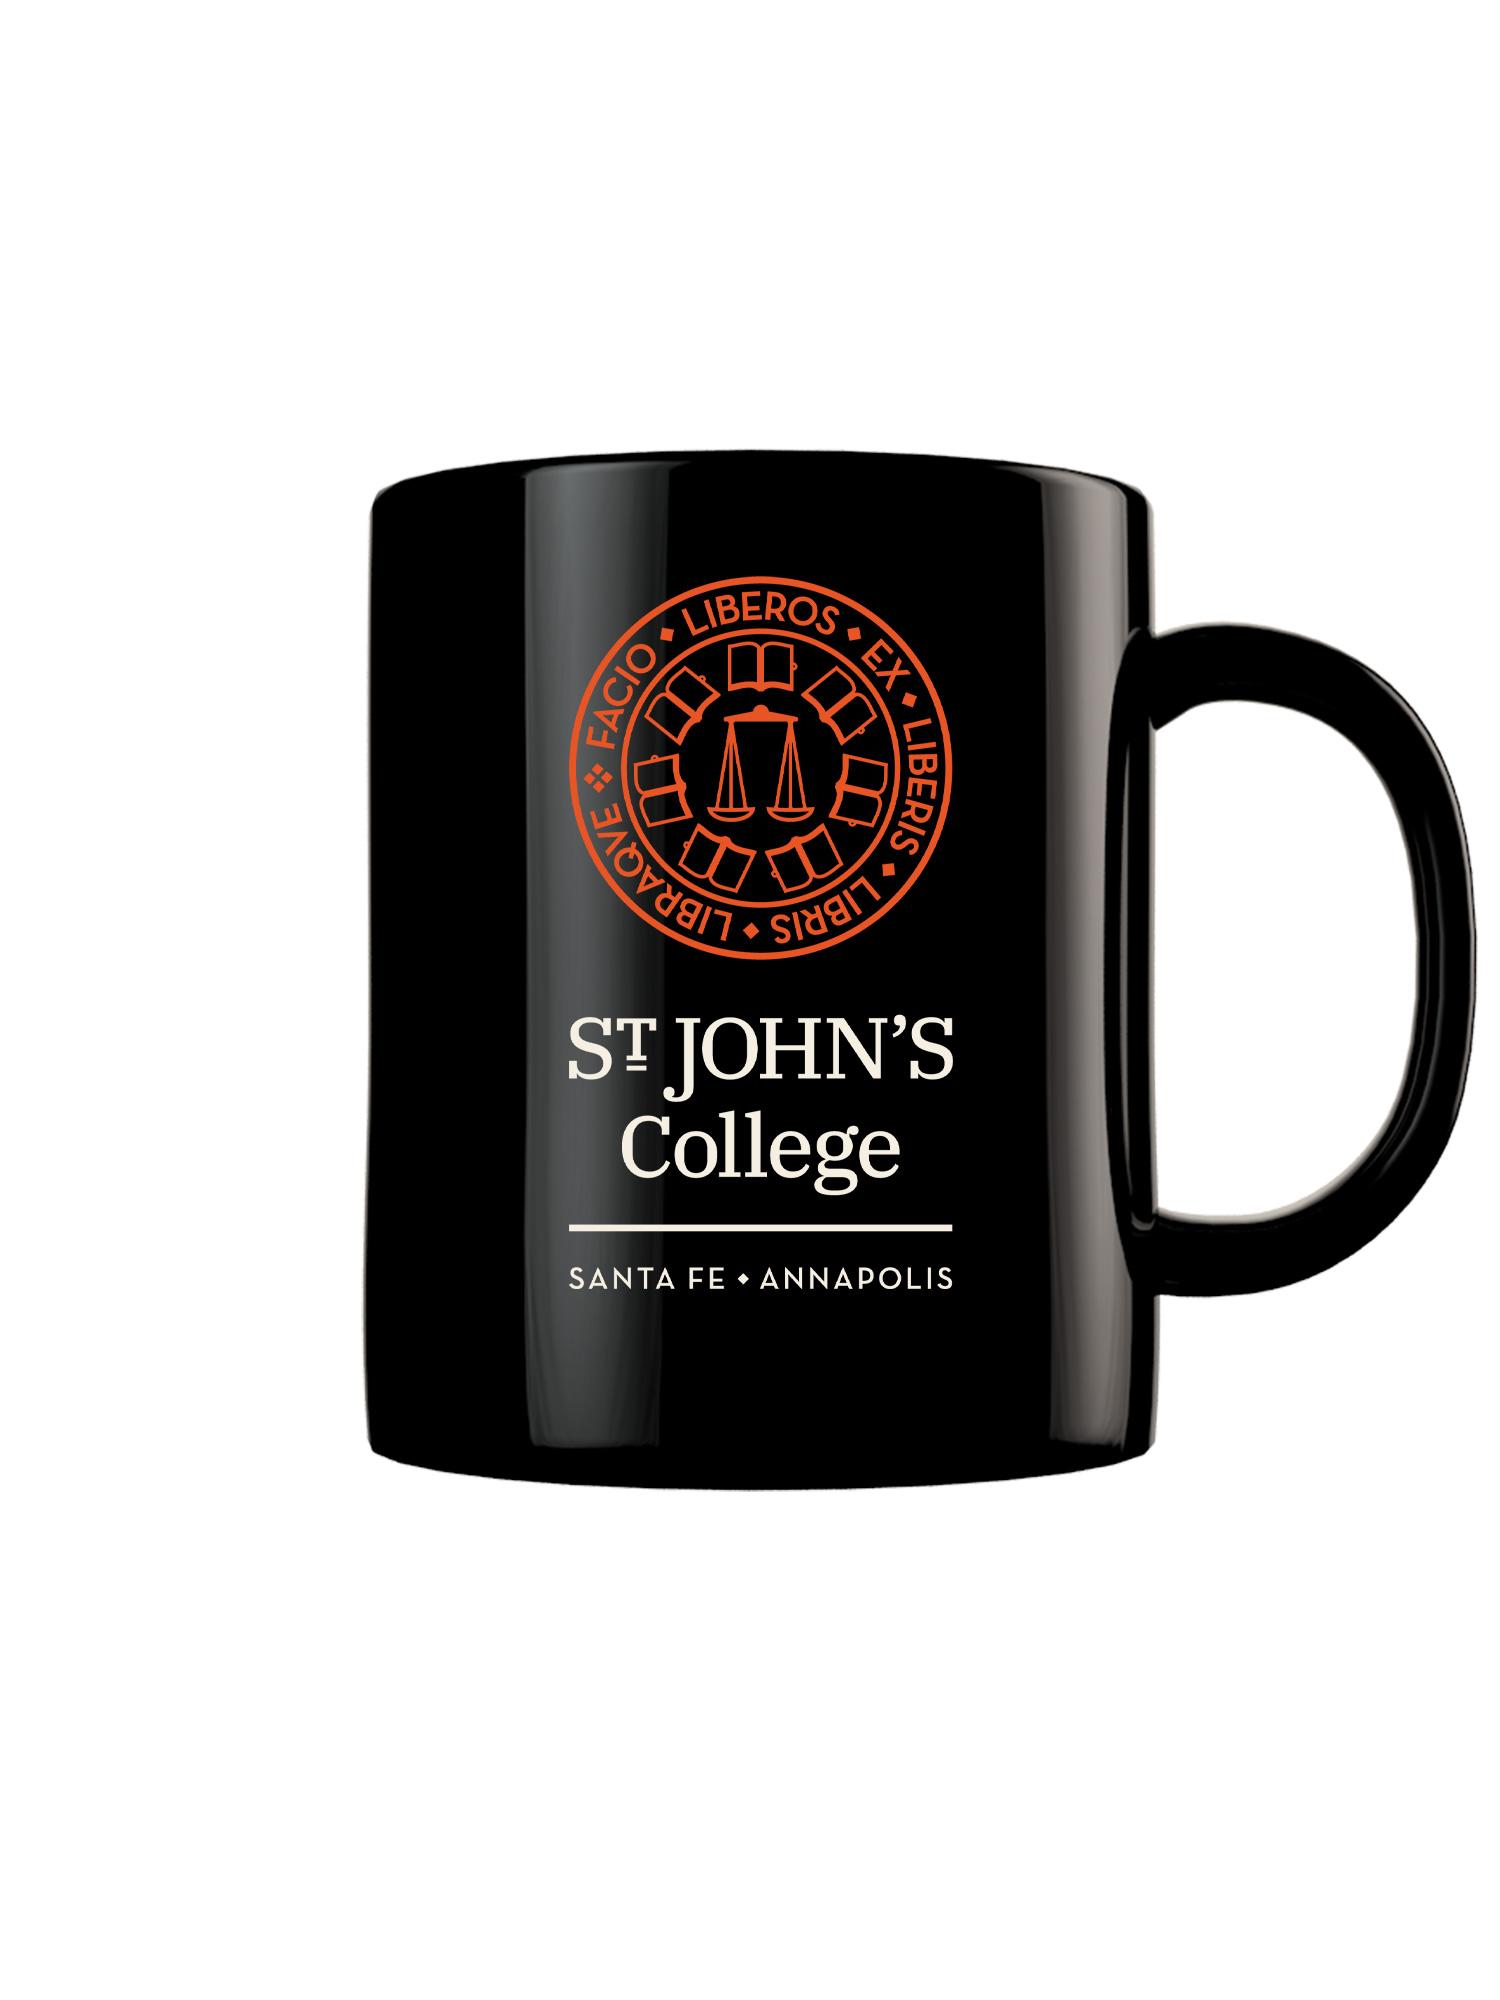 SJC_new_mug.jpg